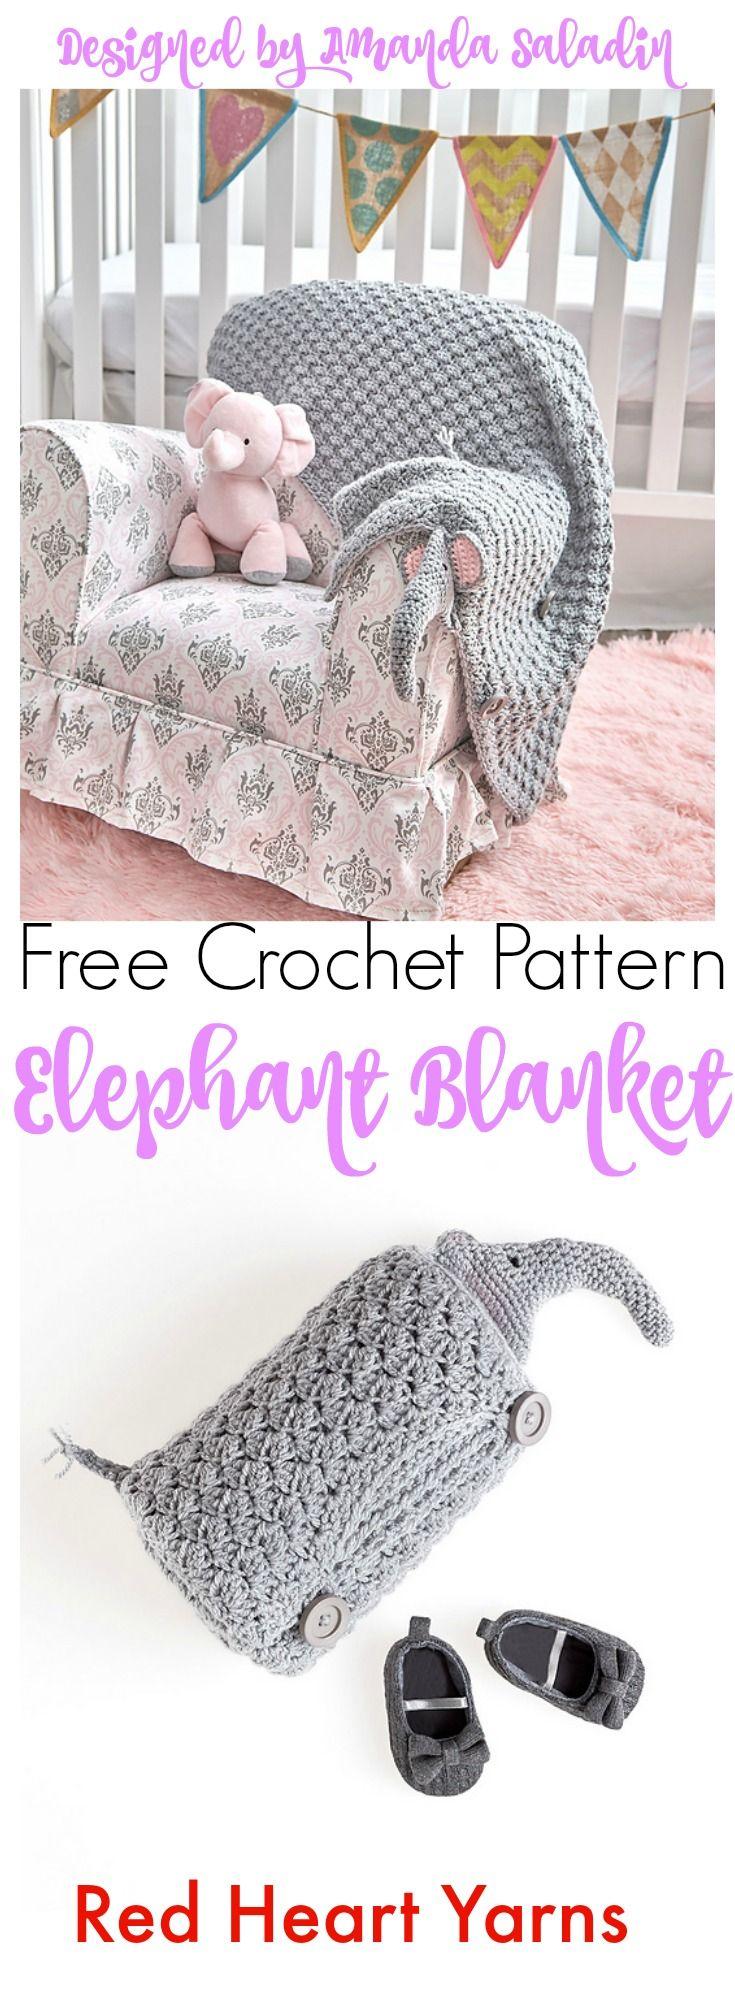 Elephant Blanket - Free Crochet Pattern | Pinterest | Cobija, Manta ...